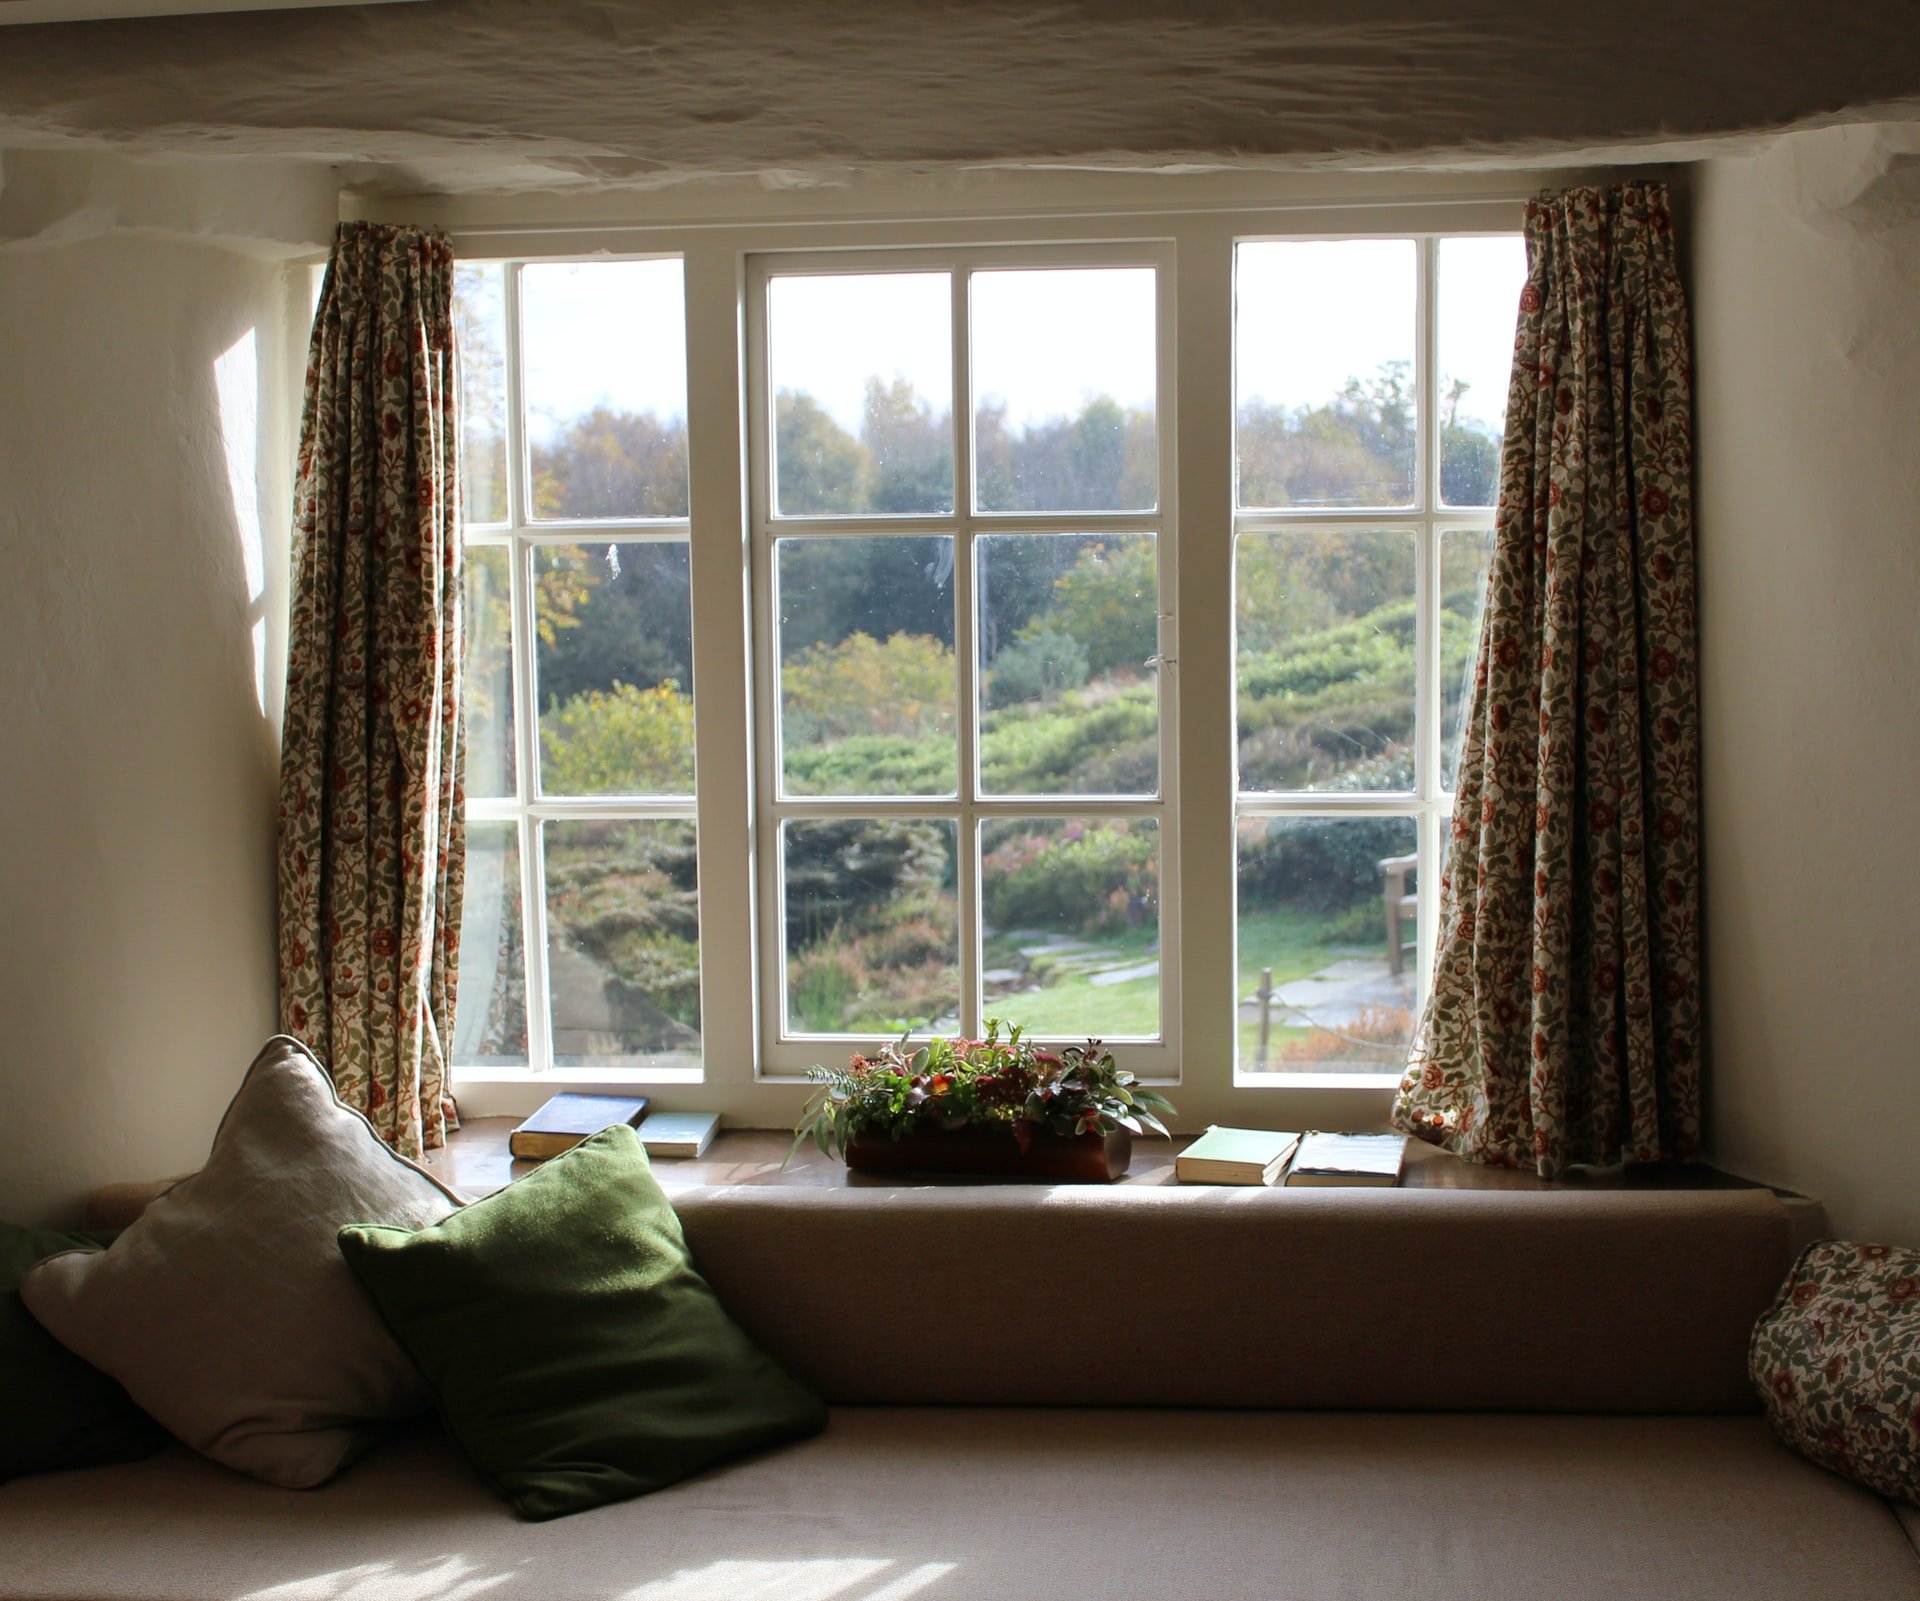 interior bay window overlooking forest